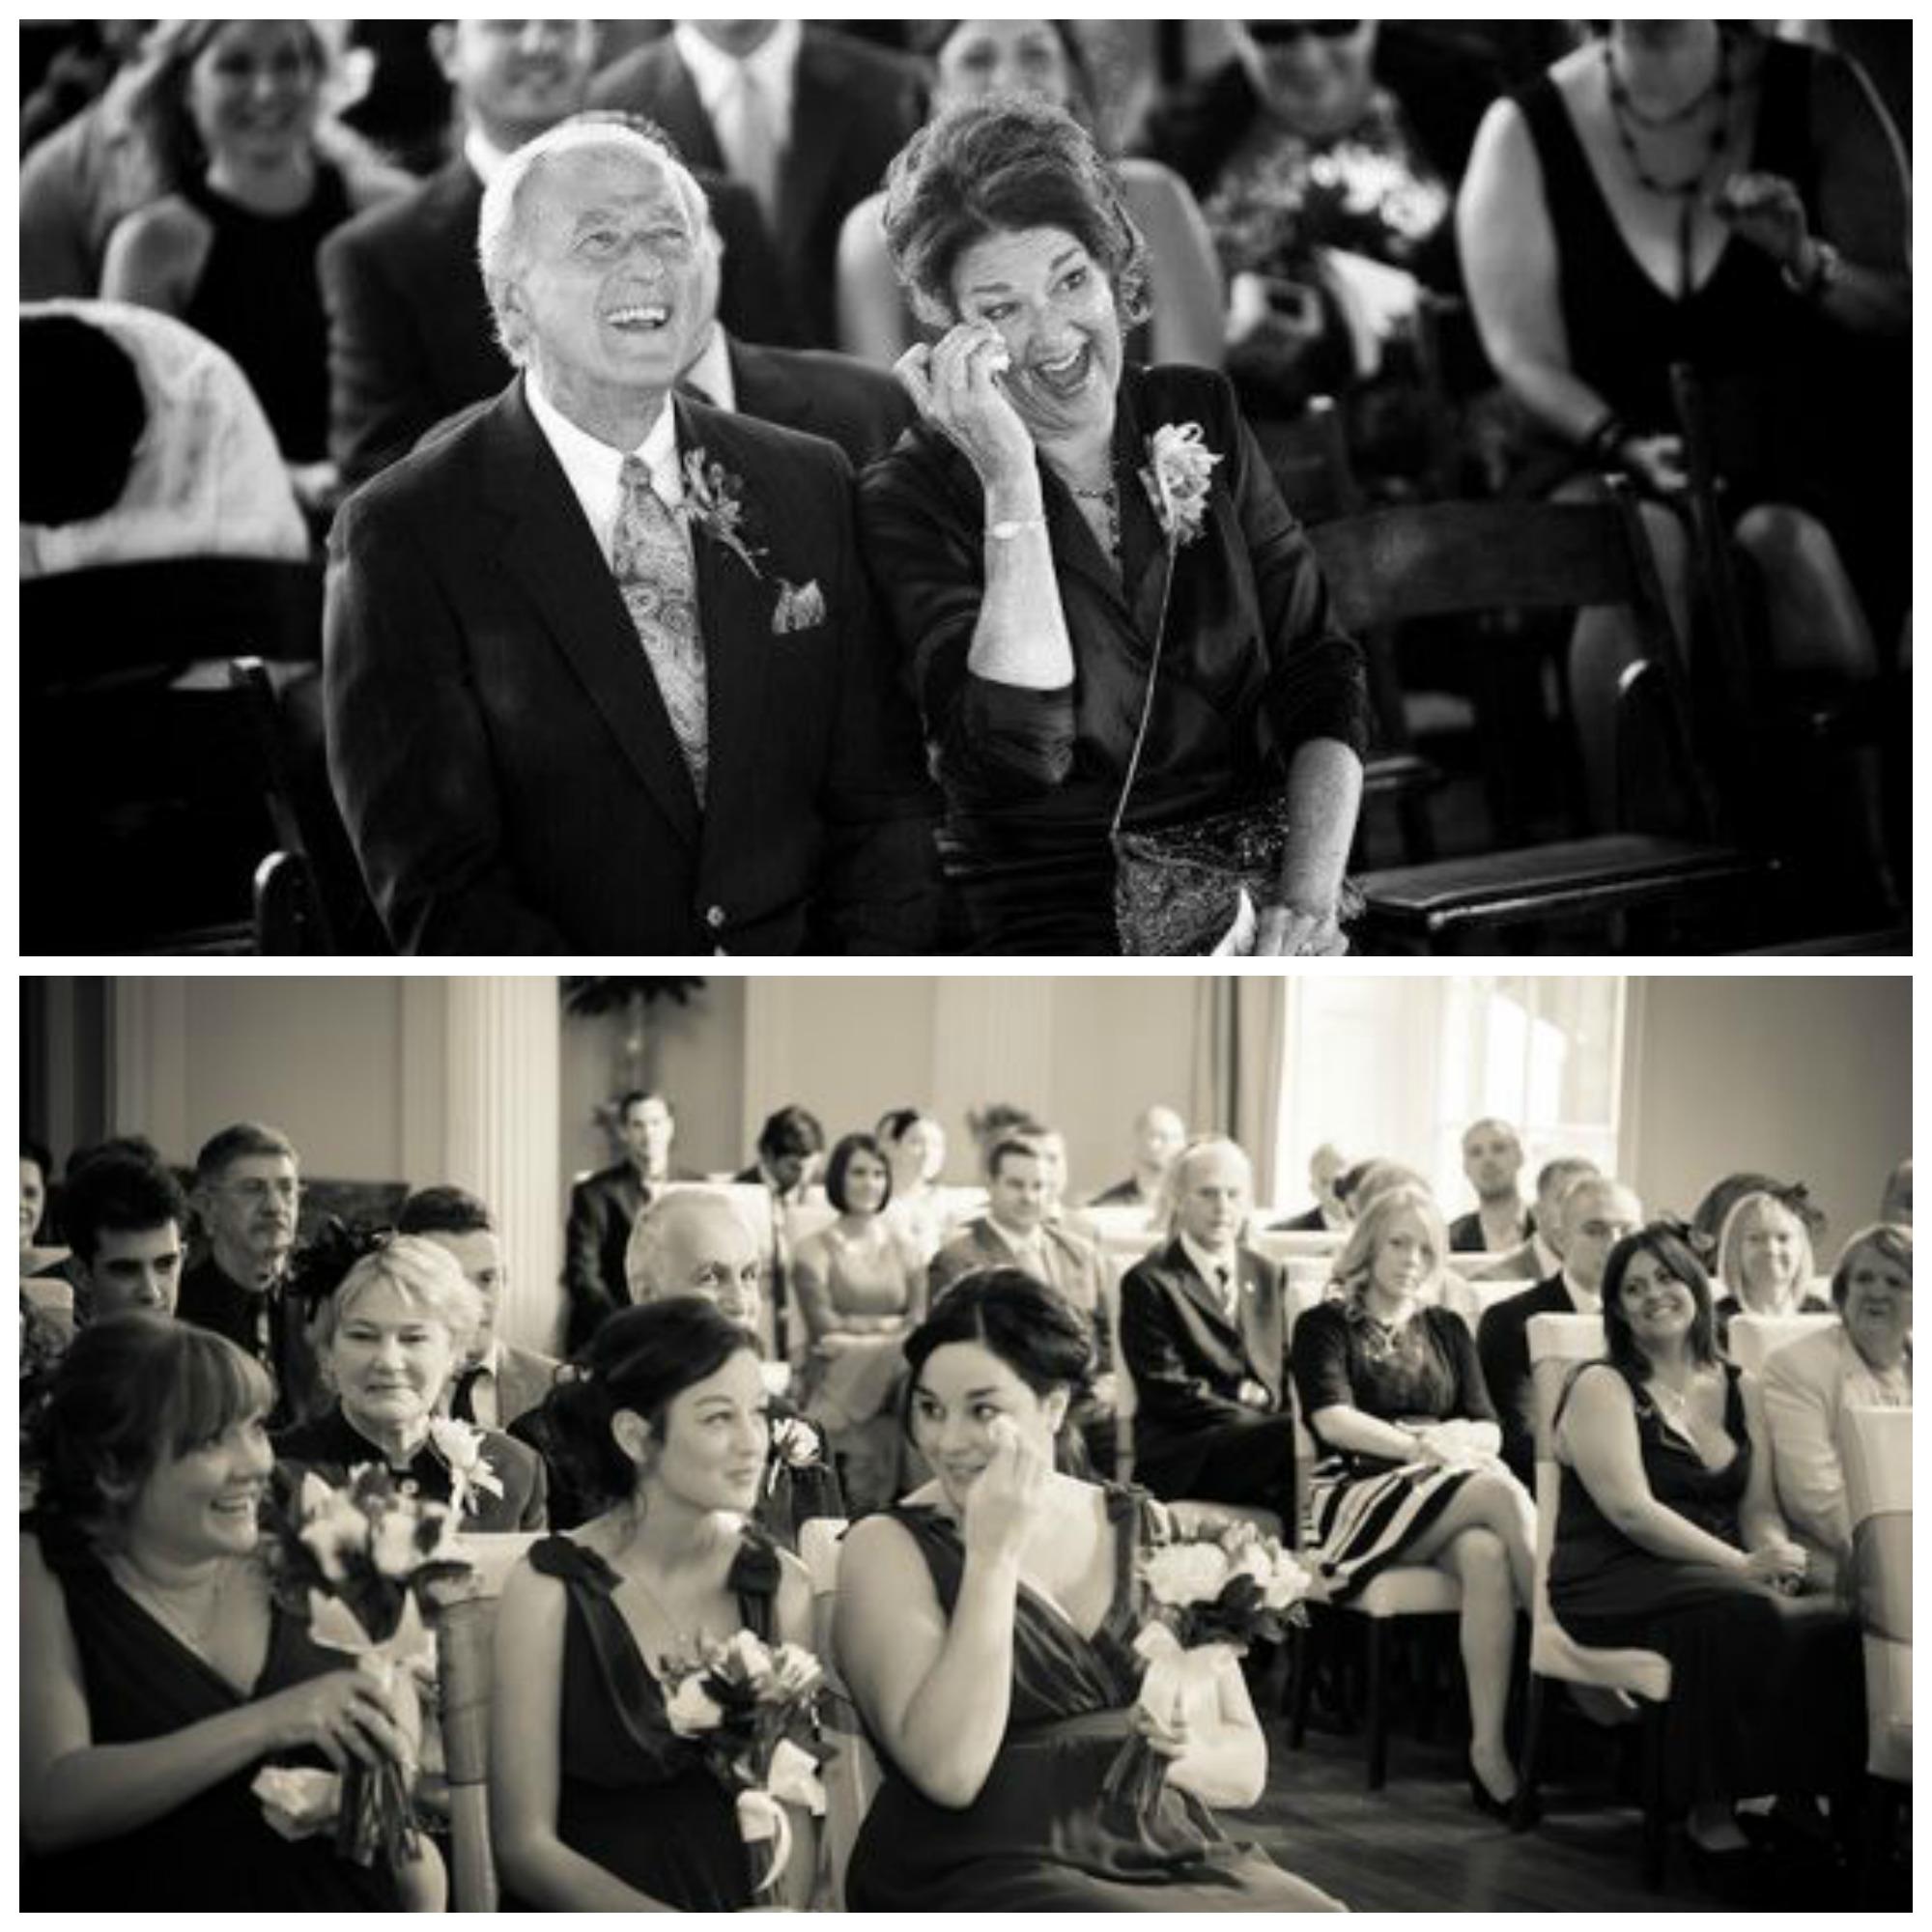 Convidados do casamento emocionados